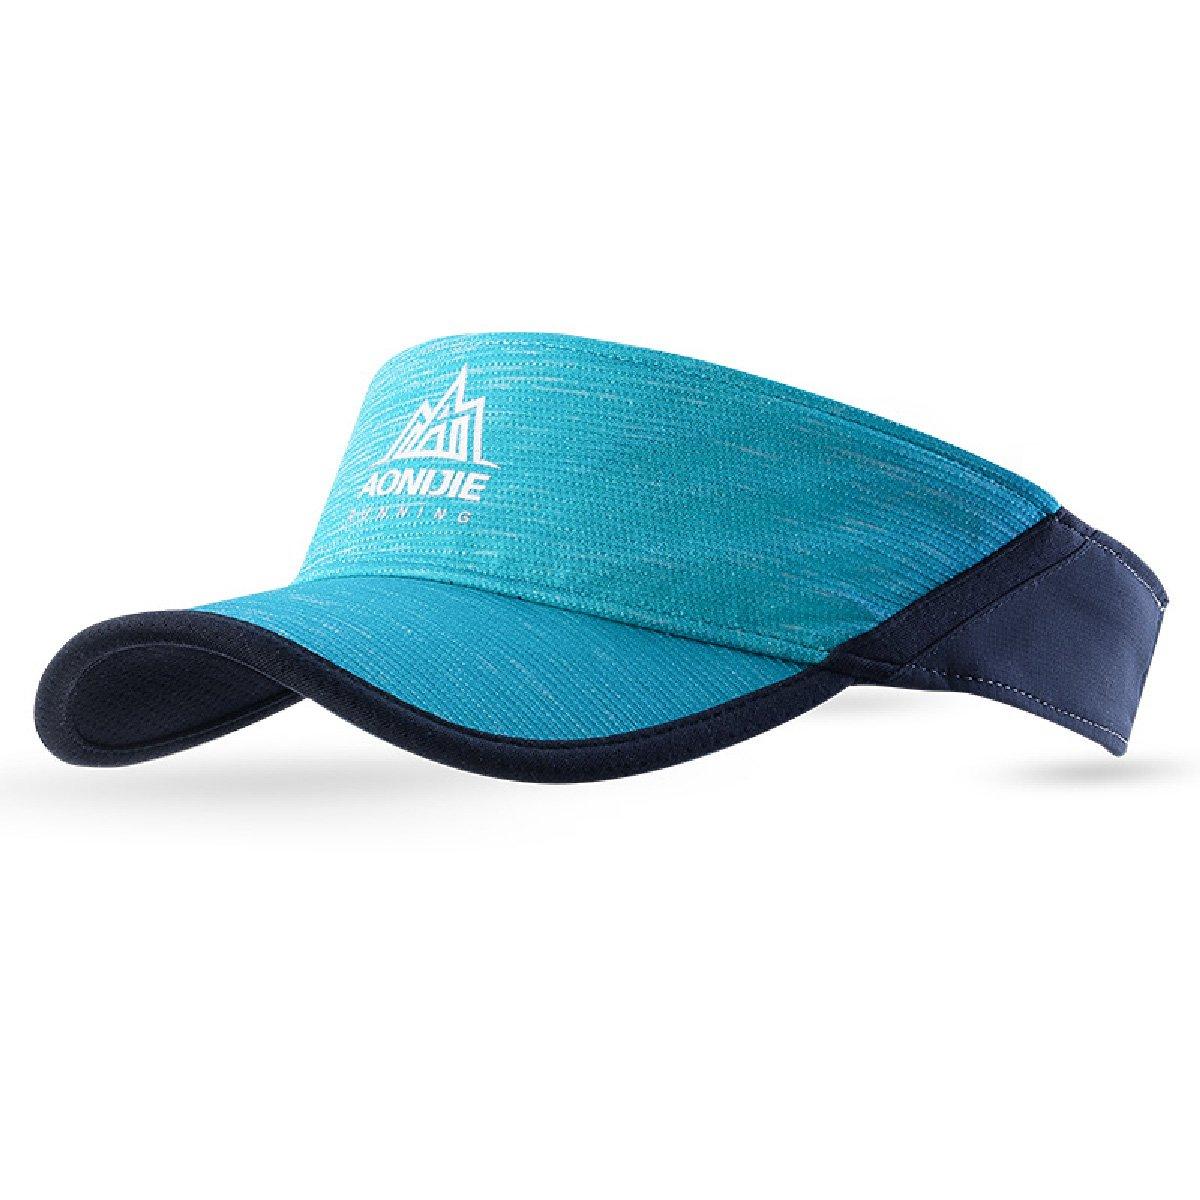 TRIWONDER Visor Cap Summer Sun Hat Men Women Outdoor Activities & Sports (Blue)